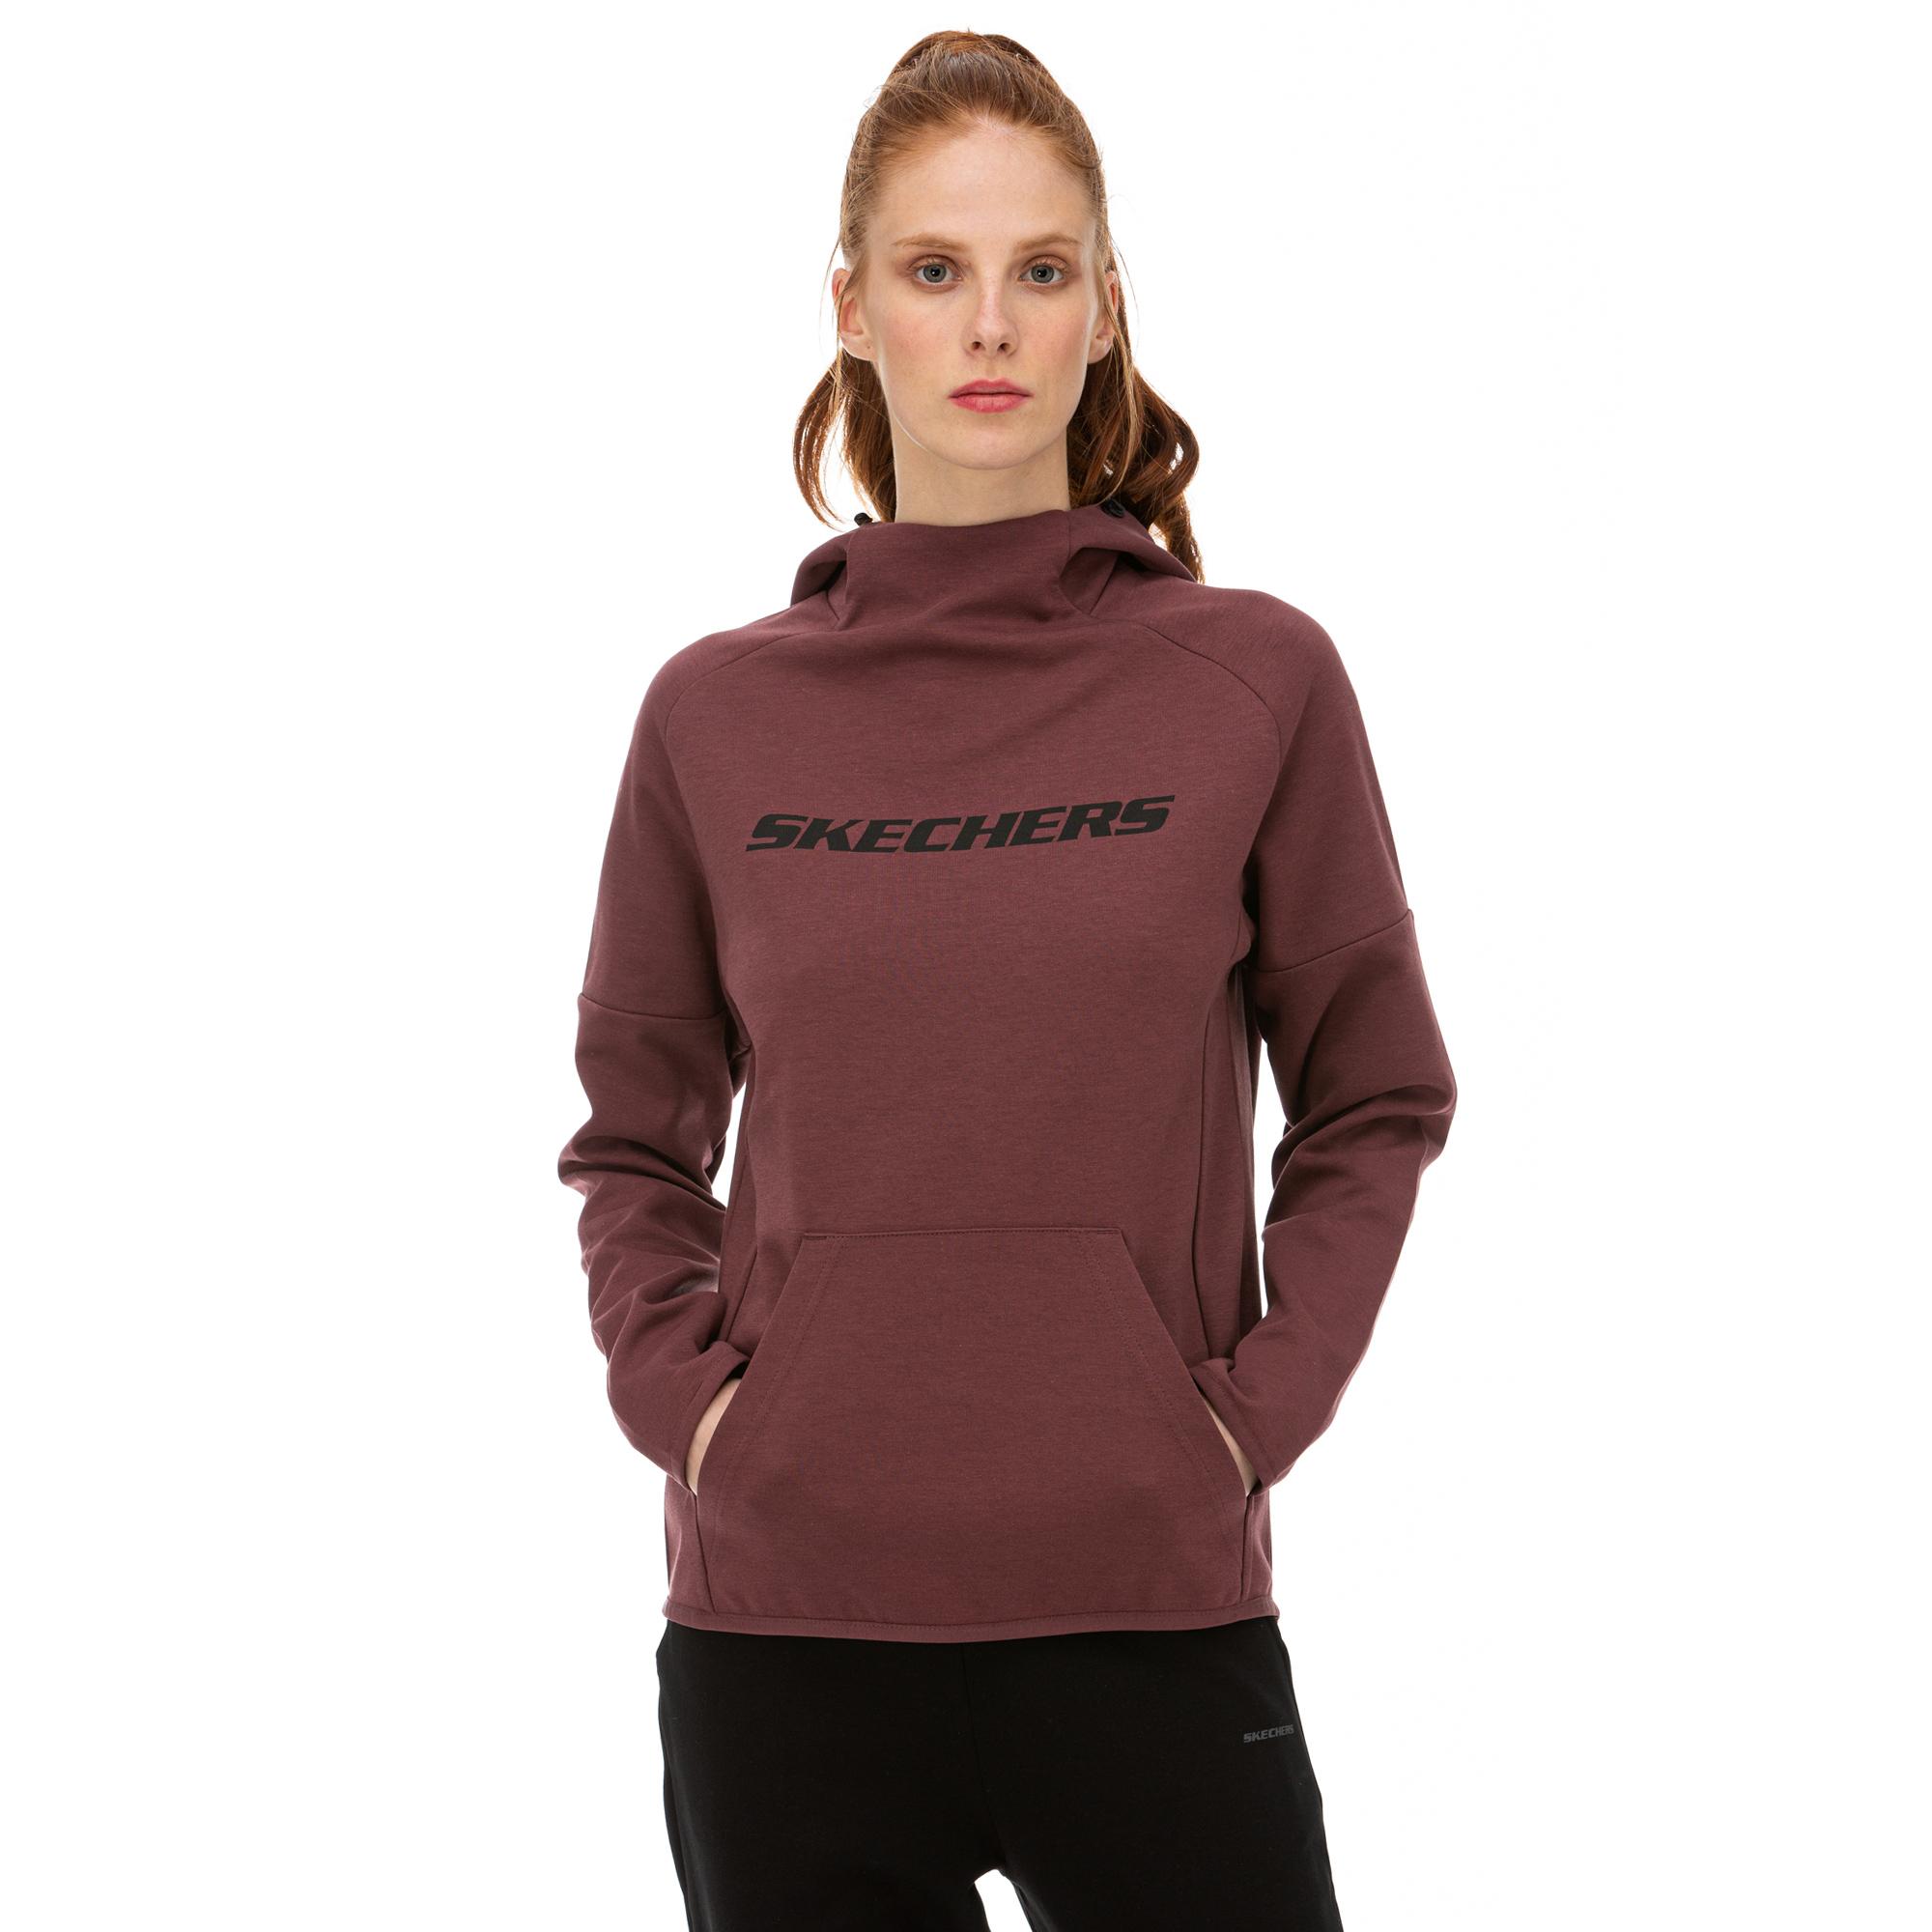 Skechers 2X I-Lock Bordo Kadın Sweatshirt